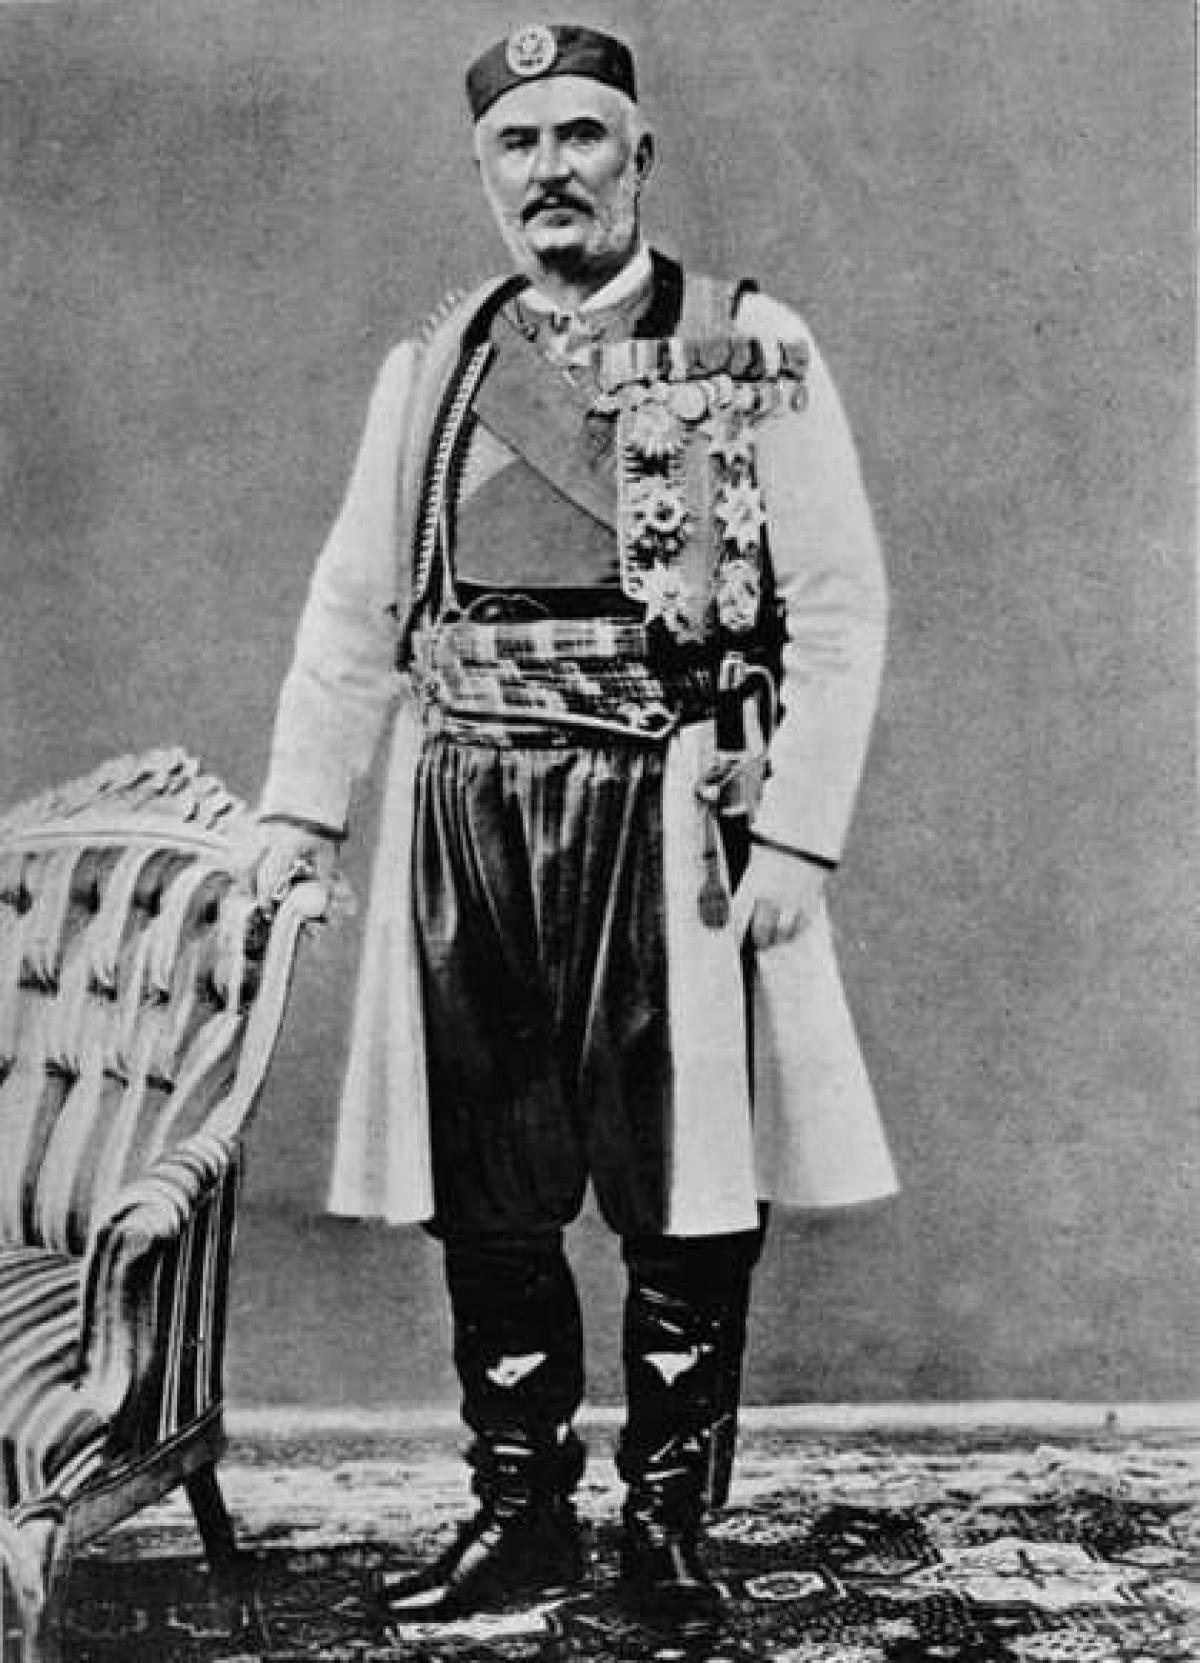 Vua Nicholas I cai trị Montenegro trong 58 năm.